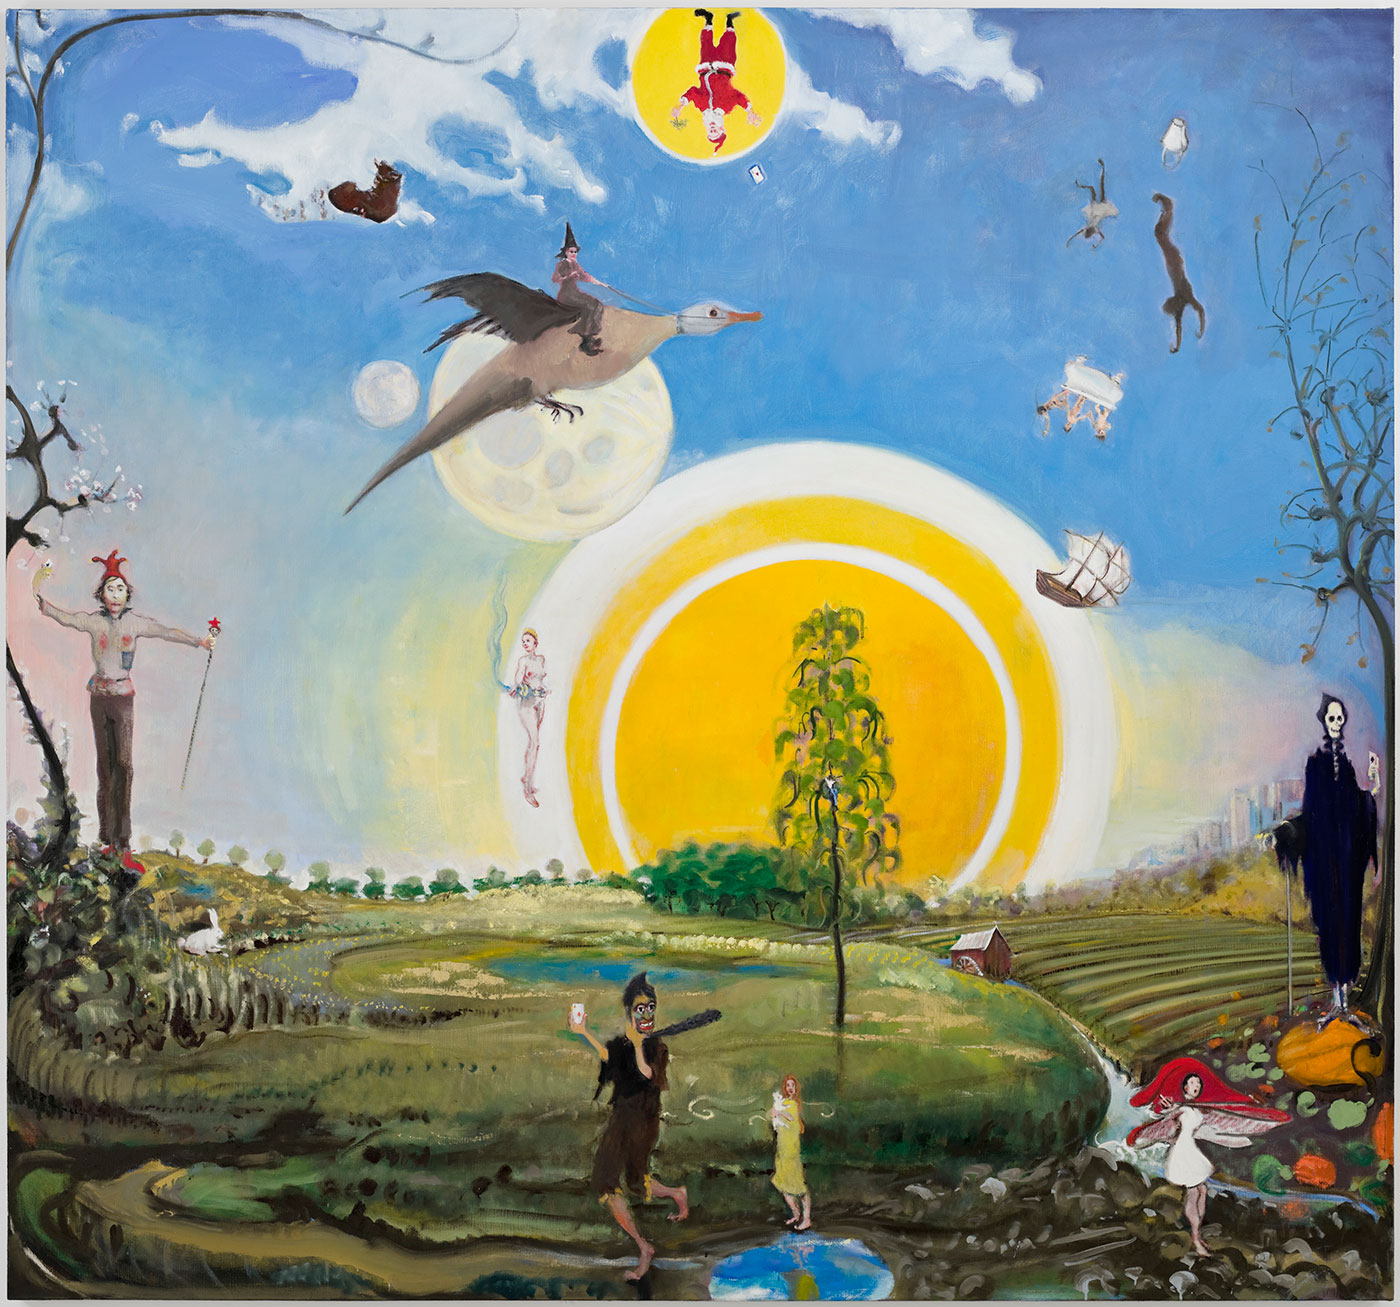 Pagan activities in pastoral landscape